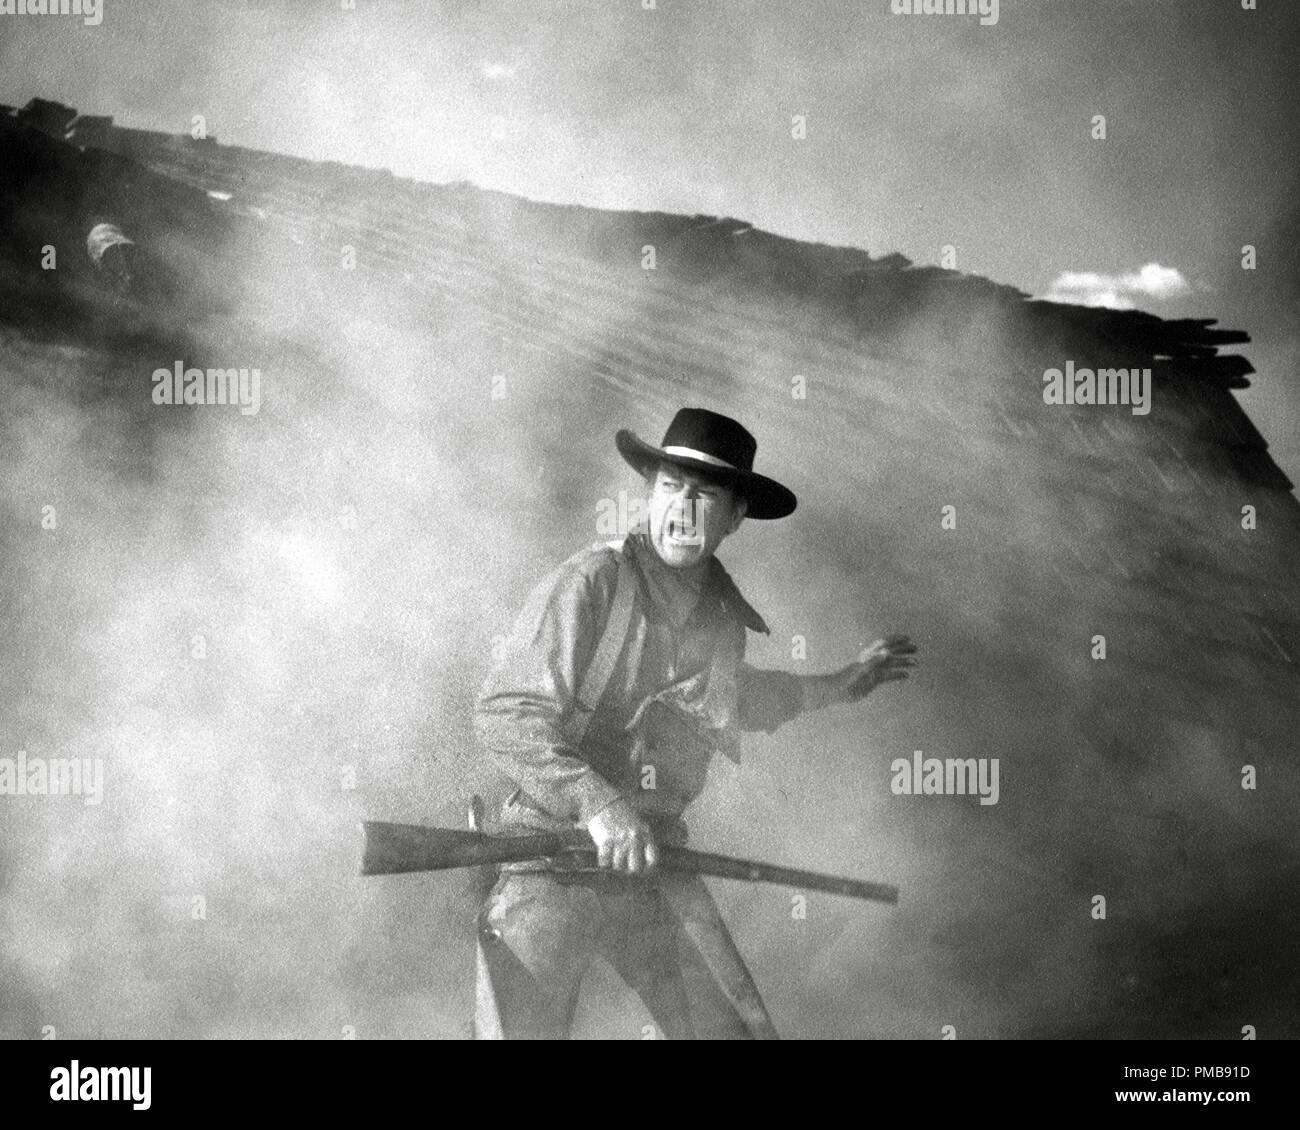 John Wayne, 'The Searchers', 1956 Warner Brothers   File Reference # 32557_391THA - Stock Image